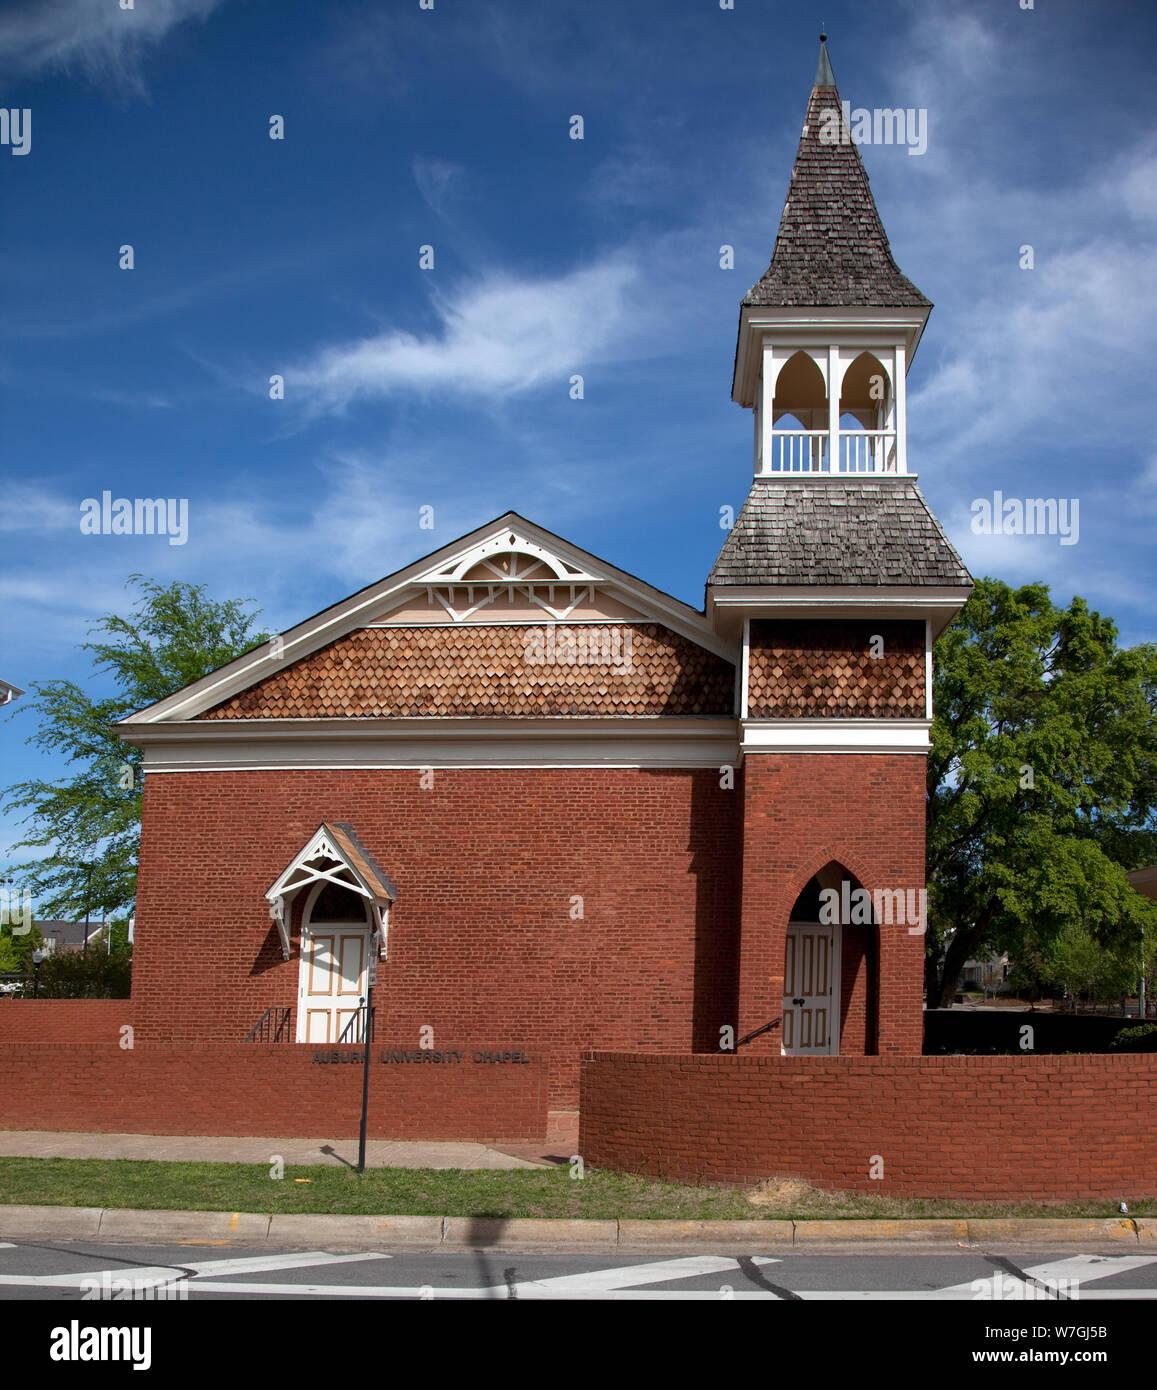 Auburn University Stock Photos & Auburn University Stock